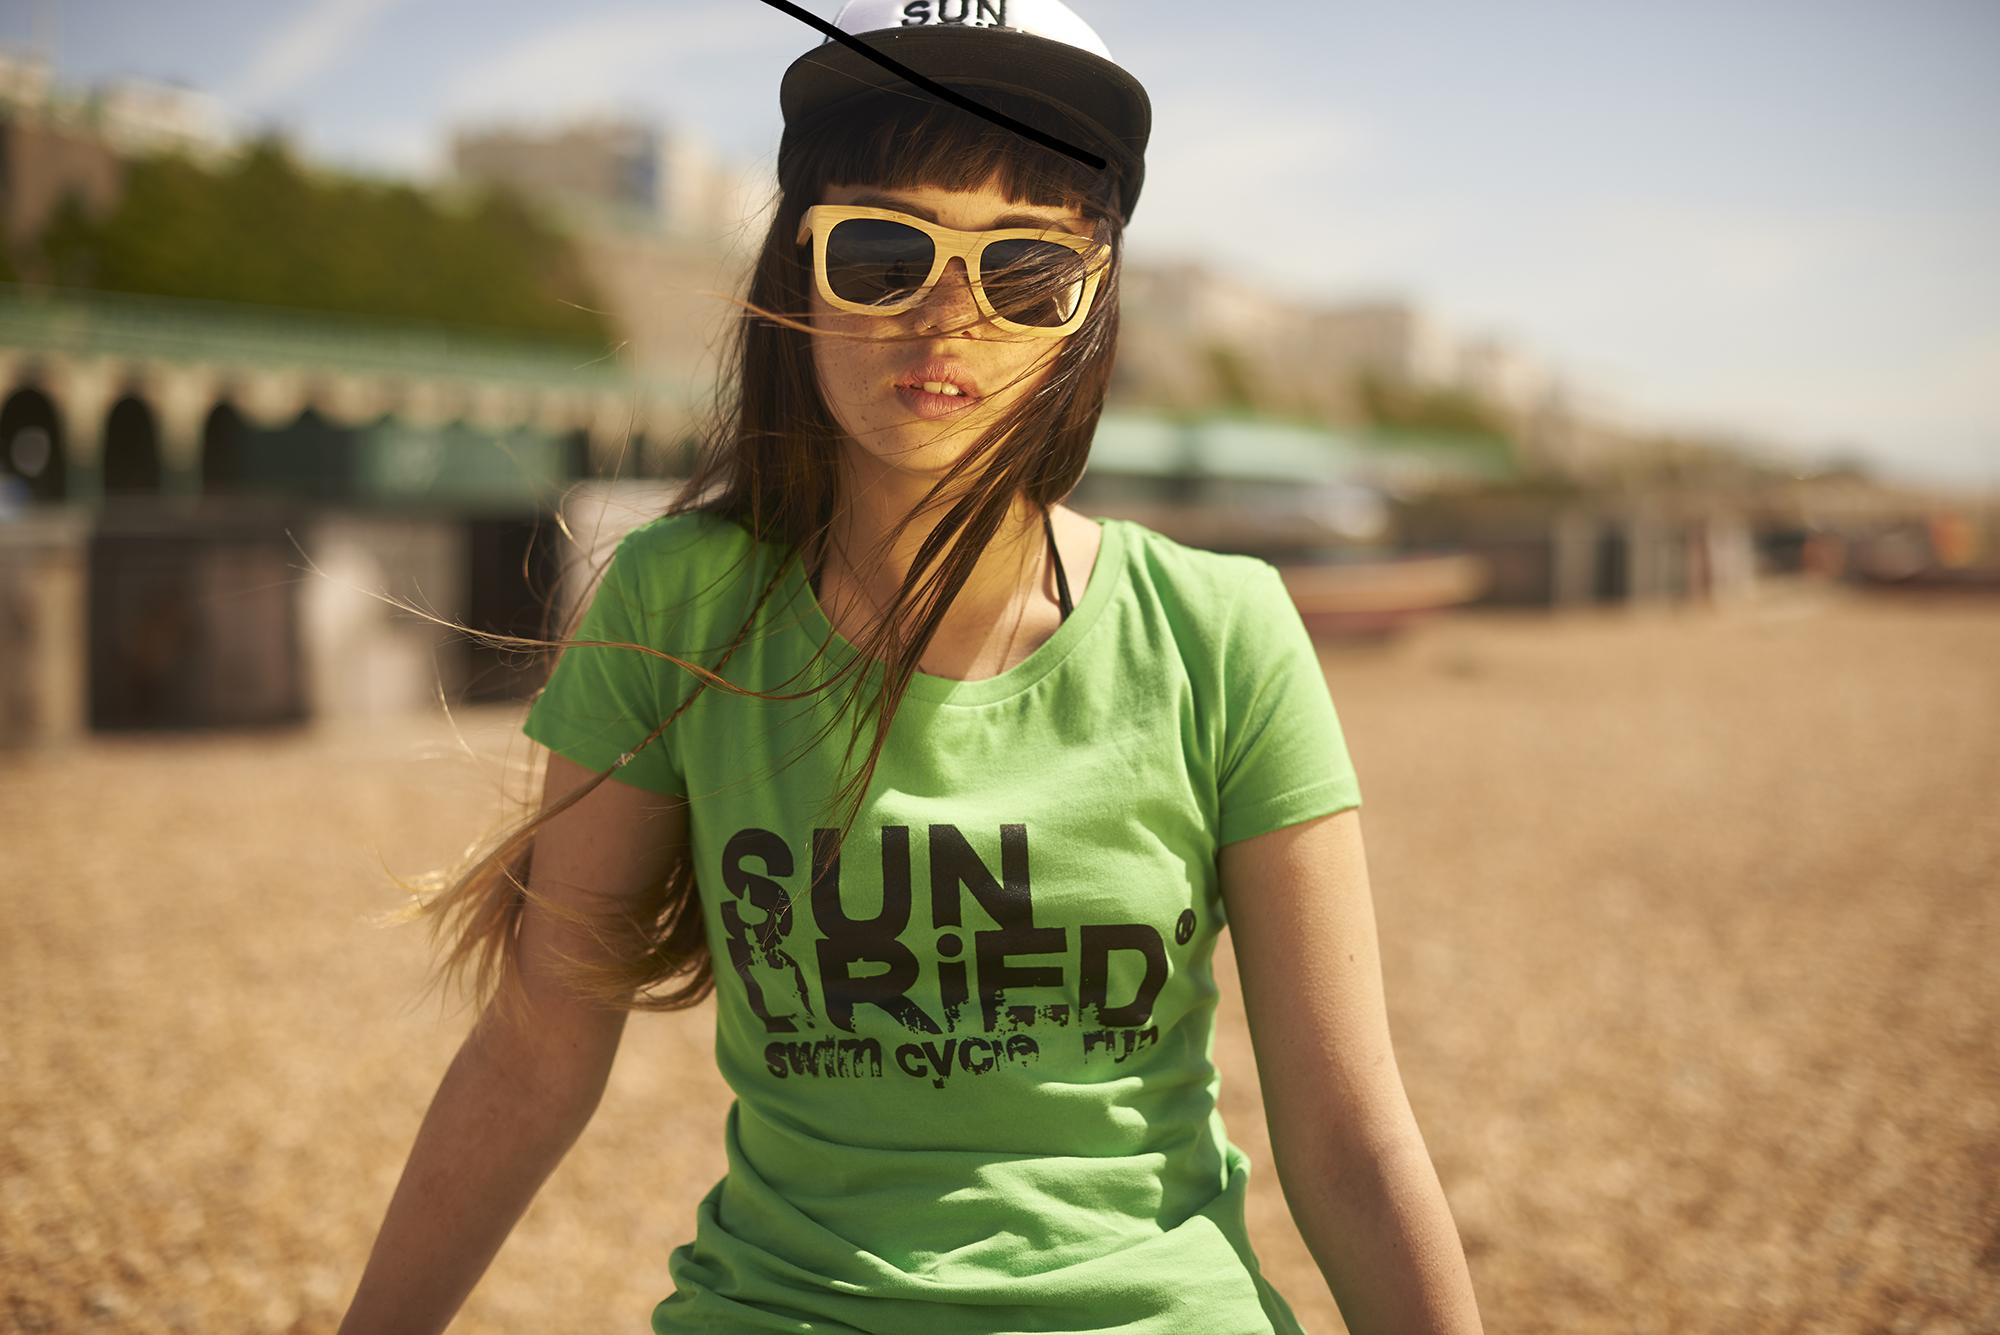 Swim Cycle Run t shirt sundried triathlon clothes